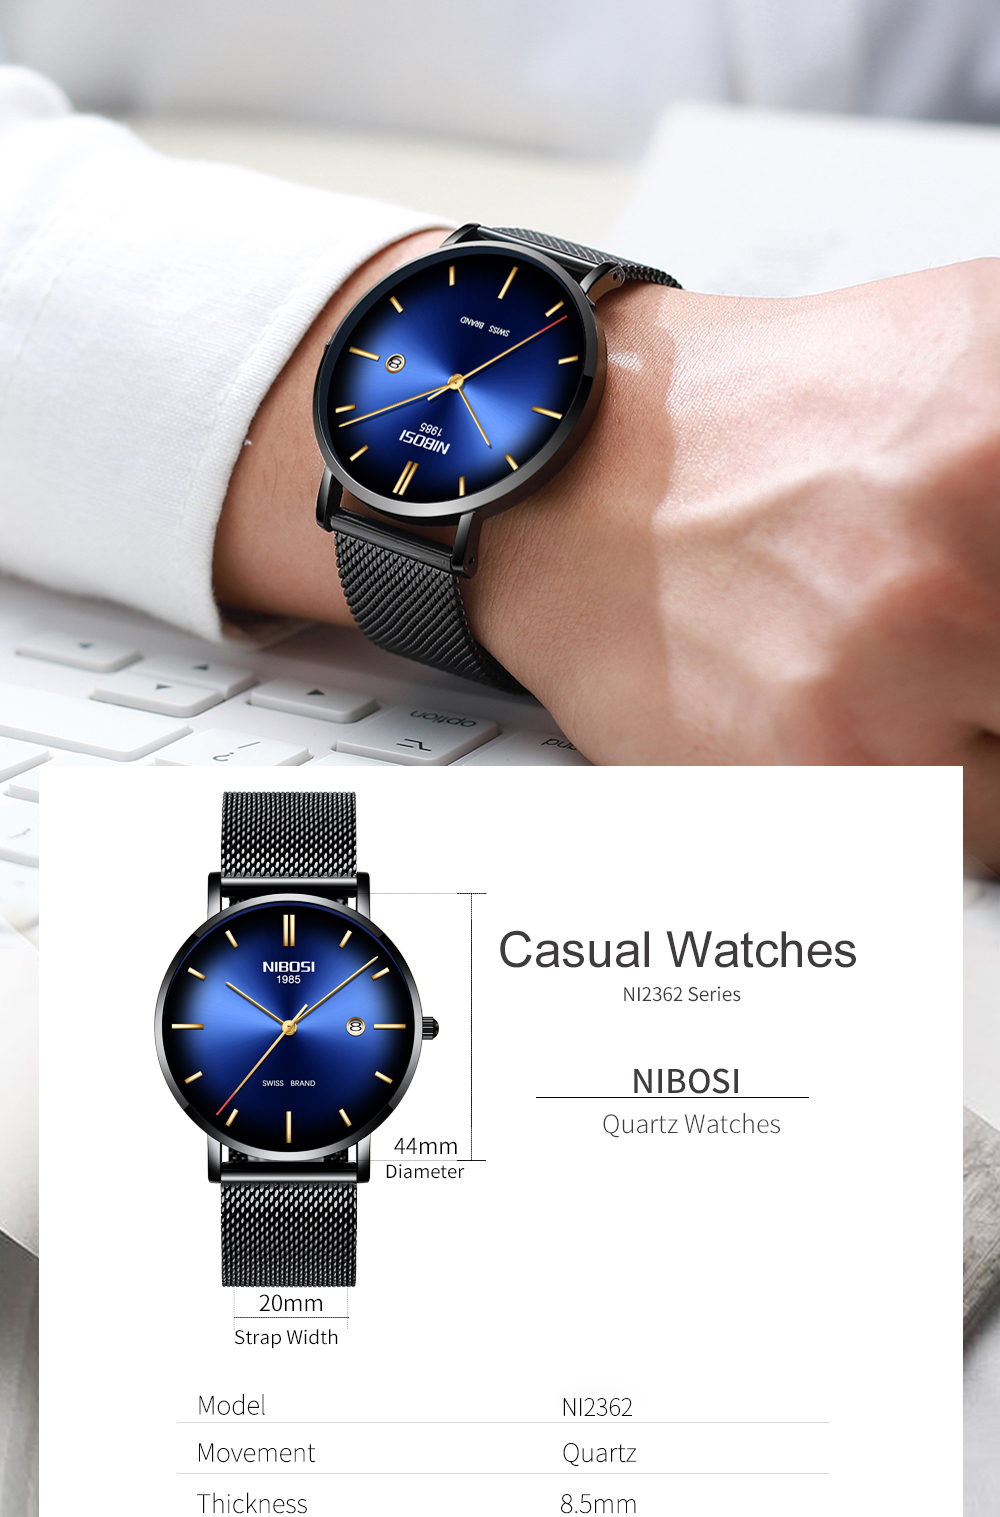 HTB1ewfGaynrK1Rjy1Xcq6yeDVXak NIBOSI Watch Men Simple Fashion Swiss Brand Quartz Watch Luxury Creative Waterproof Date Casual Men Watches Relogio Masculino